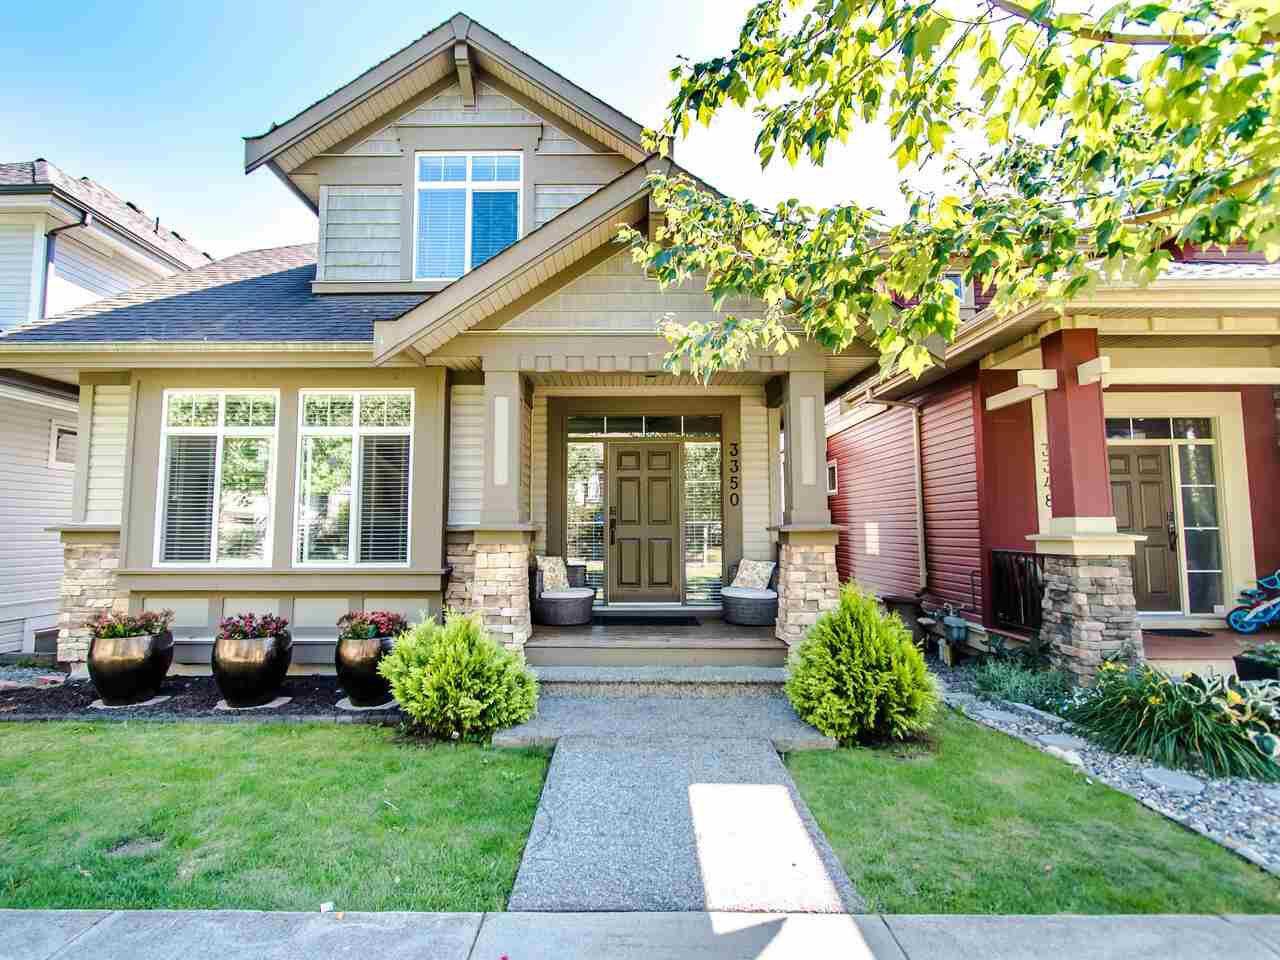 Main Photo: 3350 WATKINS Avenue in Coquitlam: Burke Mountain House for sale : MLS®# R2495245